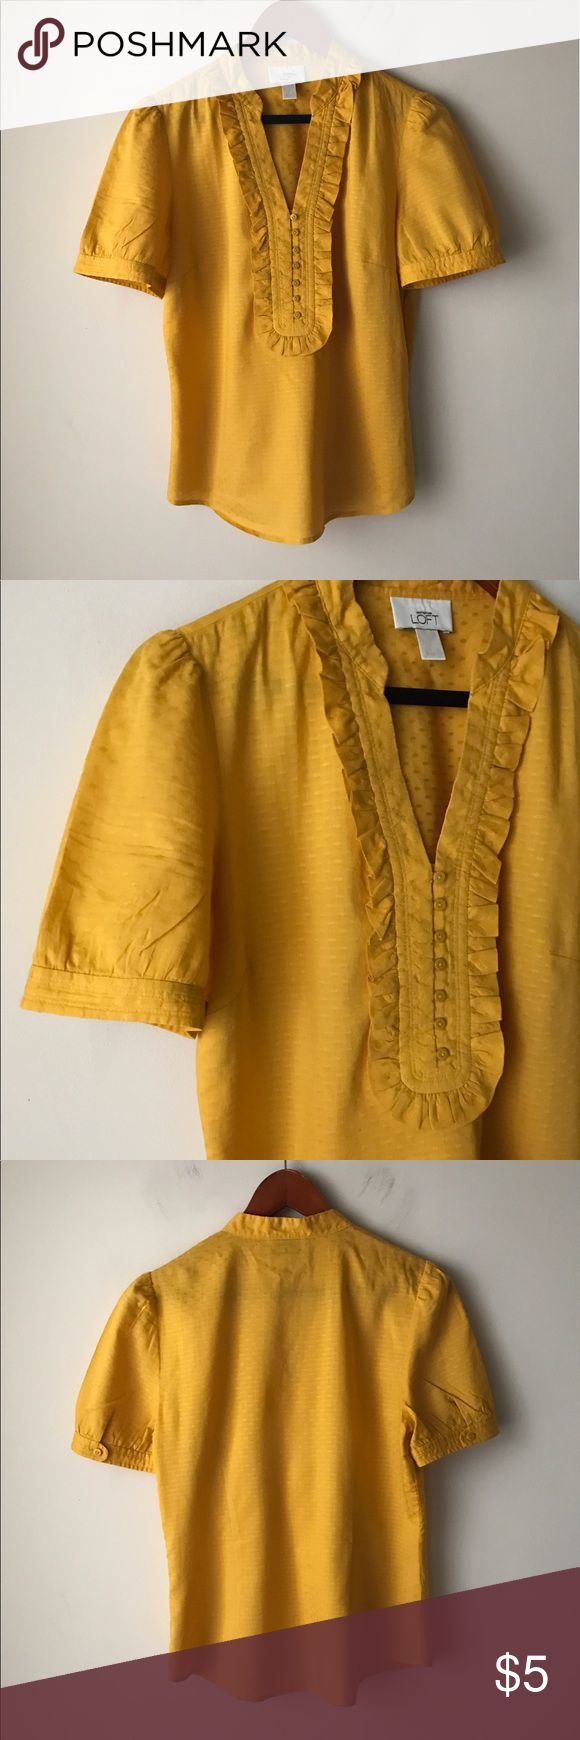 LOFT mustard yellow top Mustard yellow short sleeve top - v neckline - cute ruffle detail - size S LOFT Tops